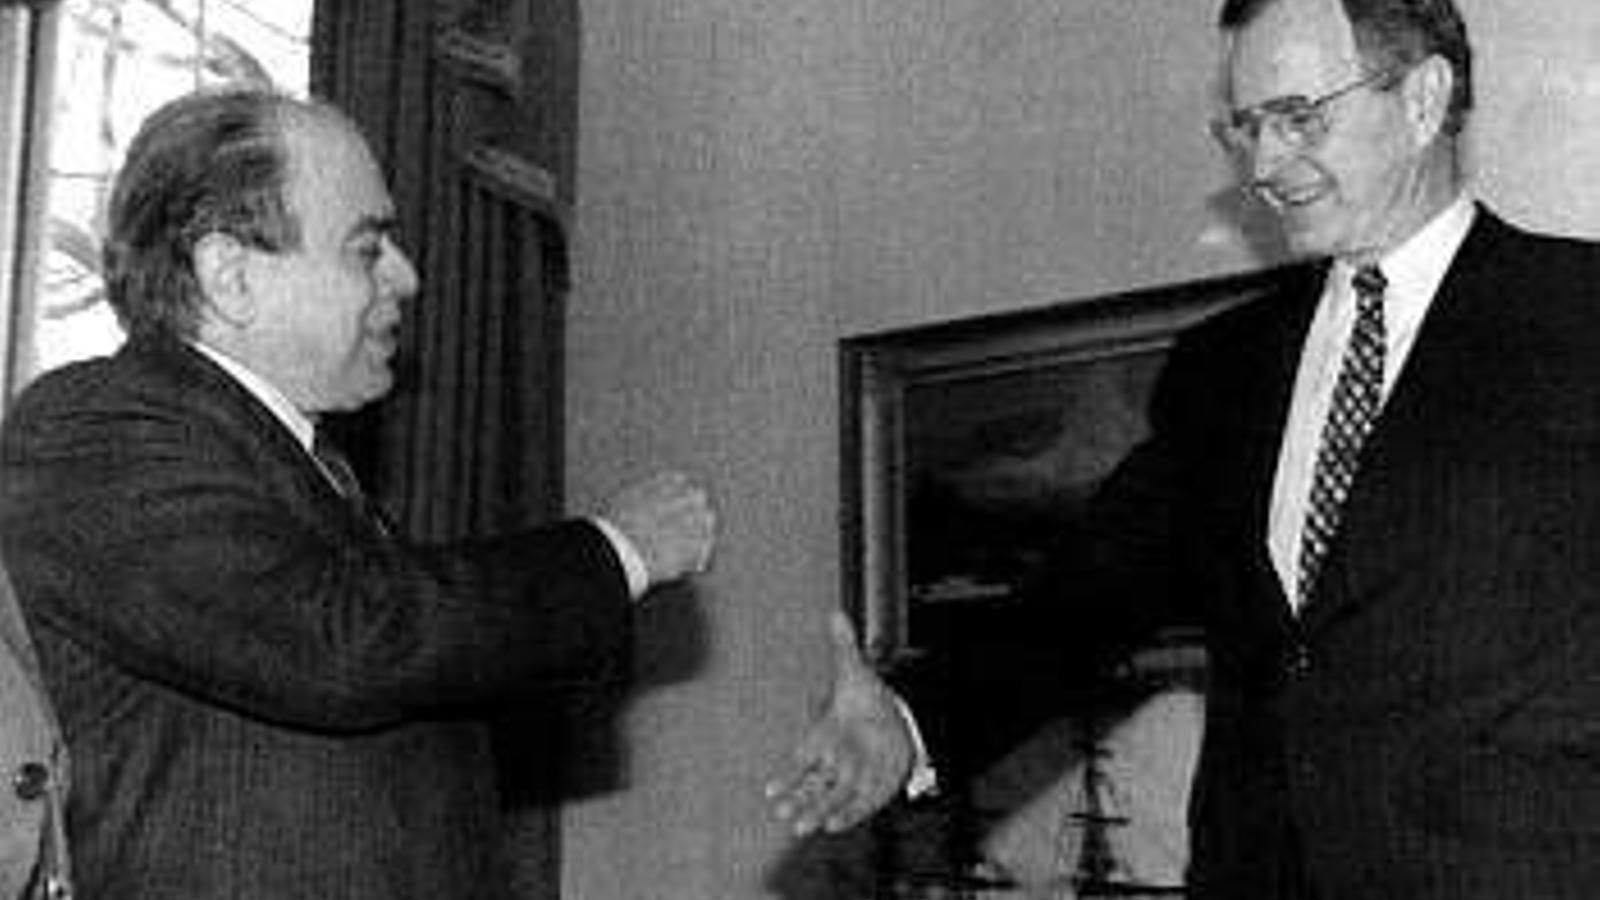 Jordi Pujol i George Bush pare donant-se la mà a la Casa Blanca.